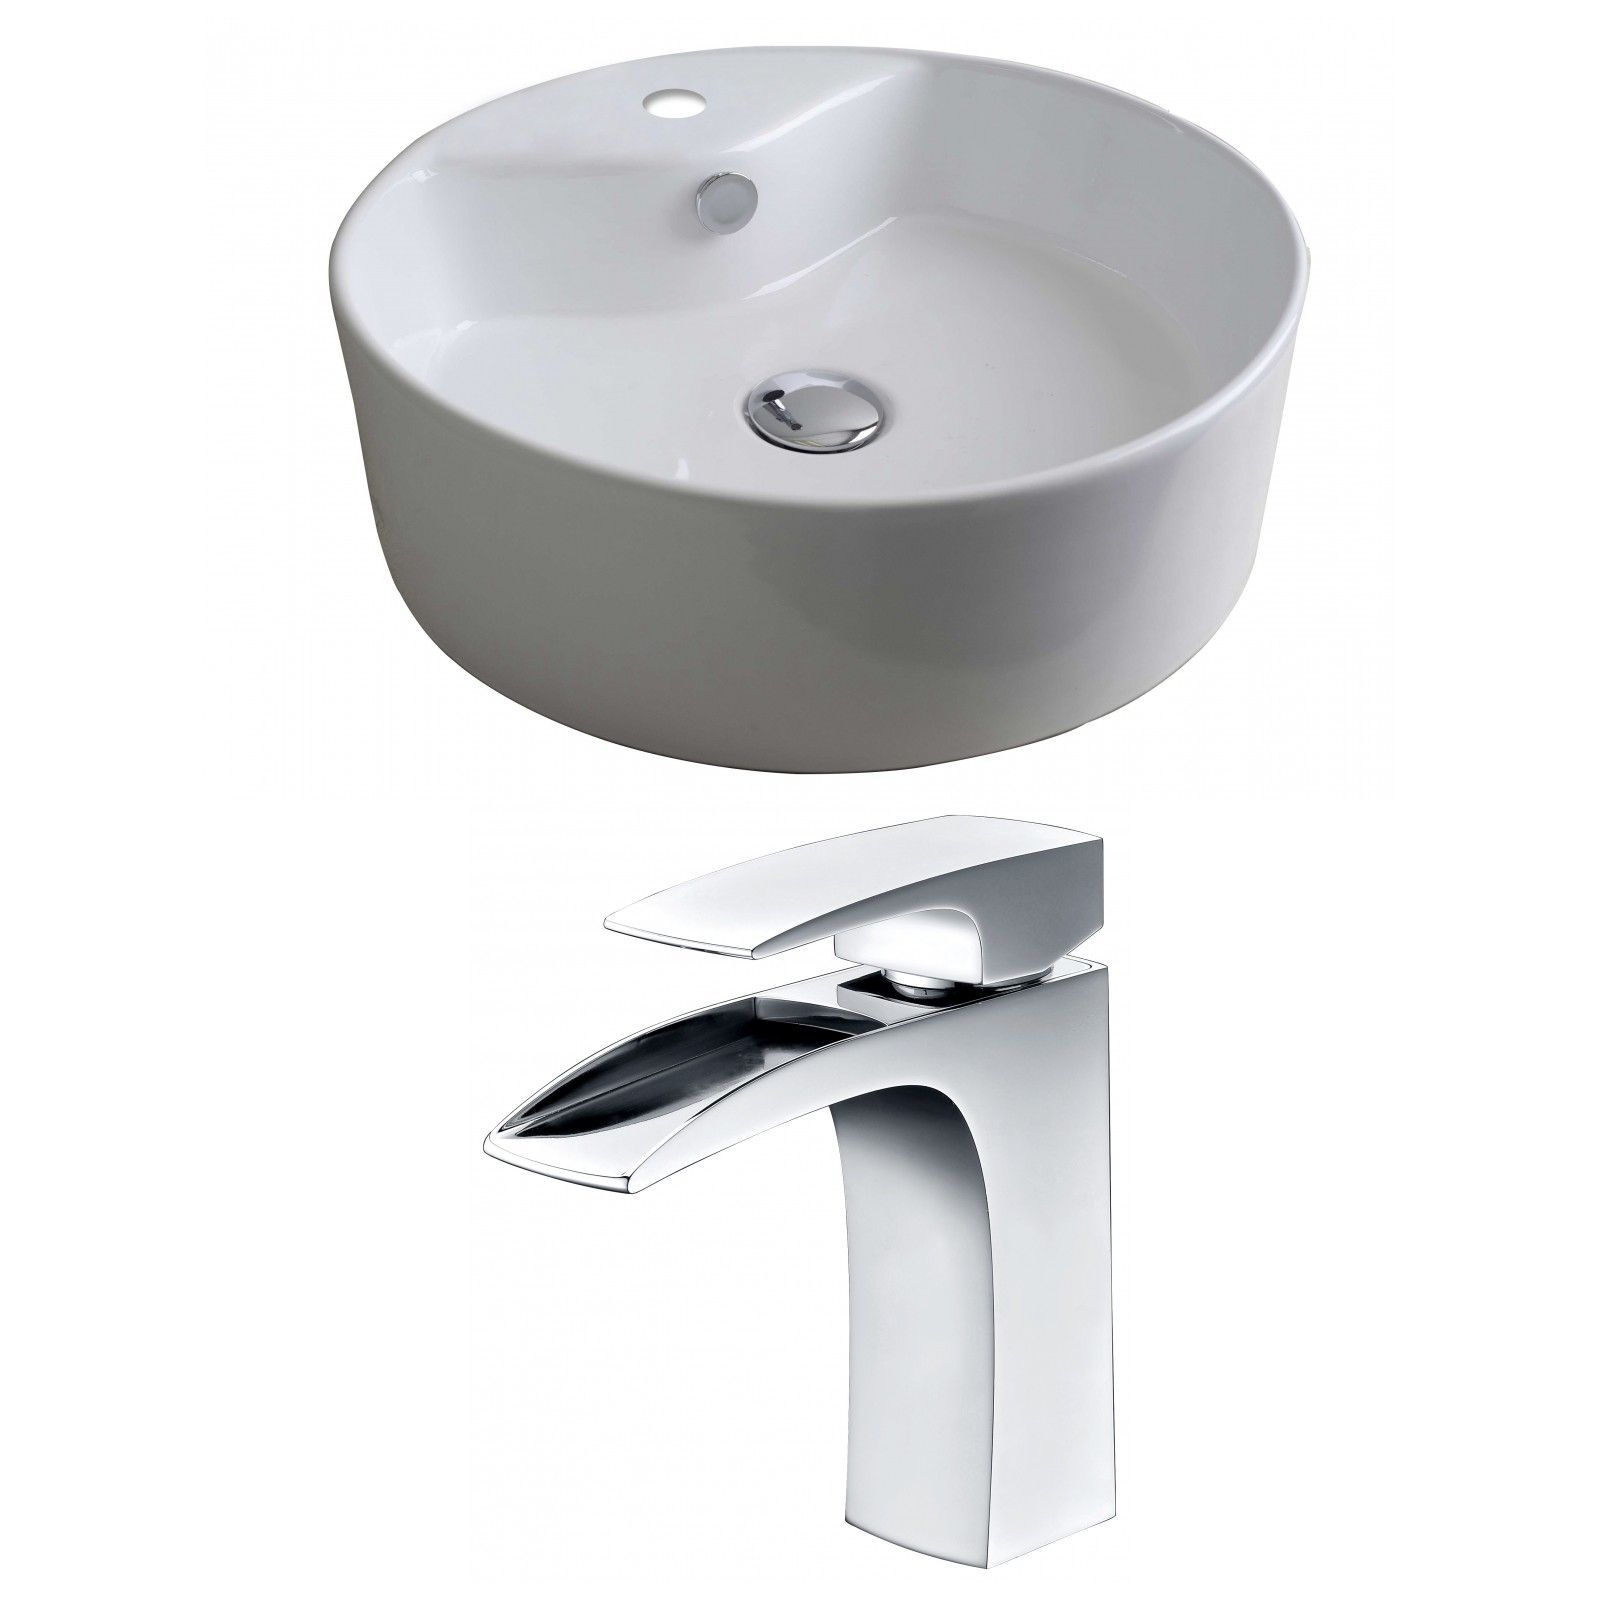 Round Vessel Sink with Overflow